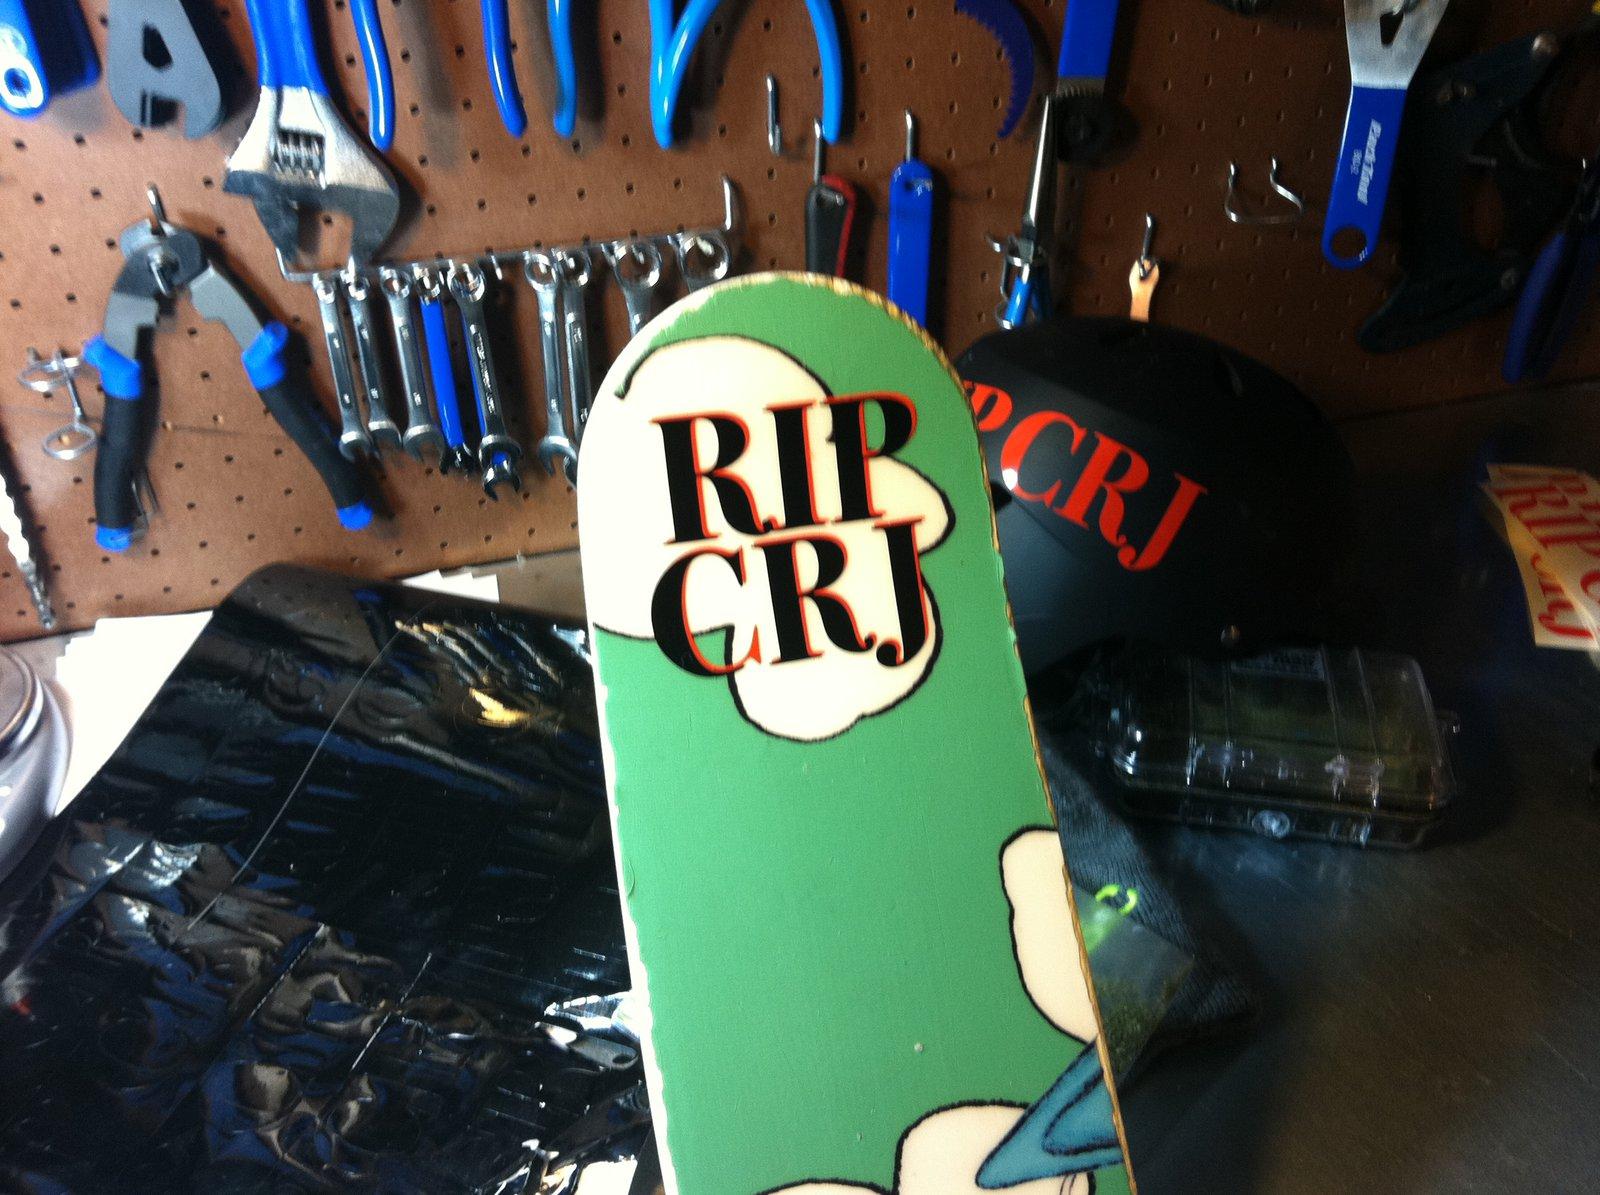 RIP CRJ